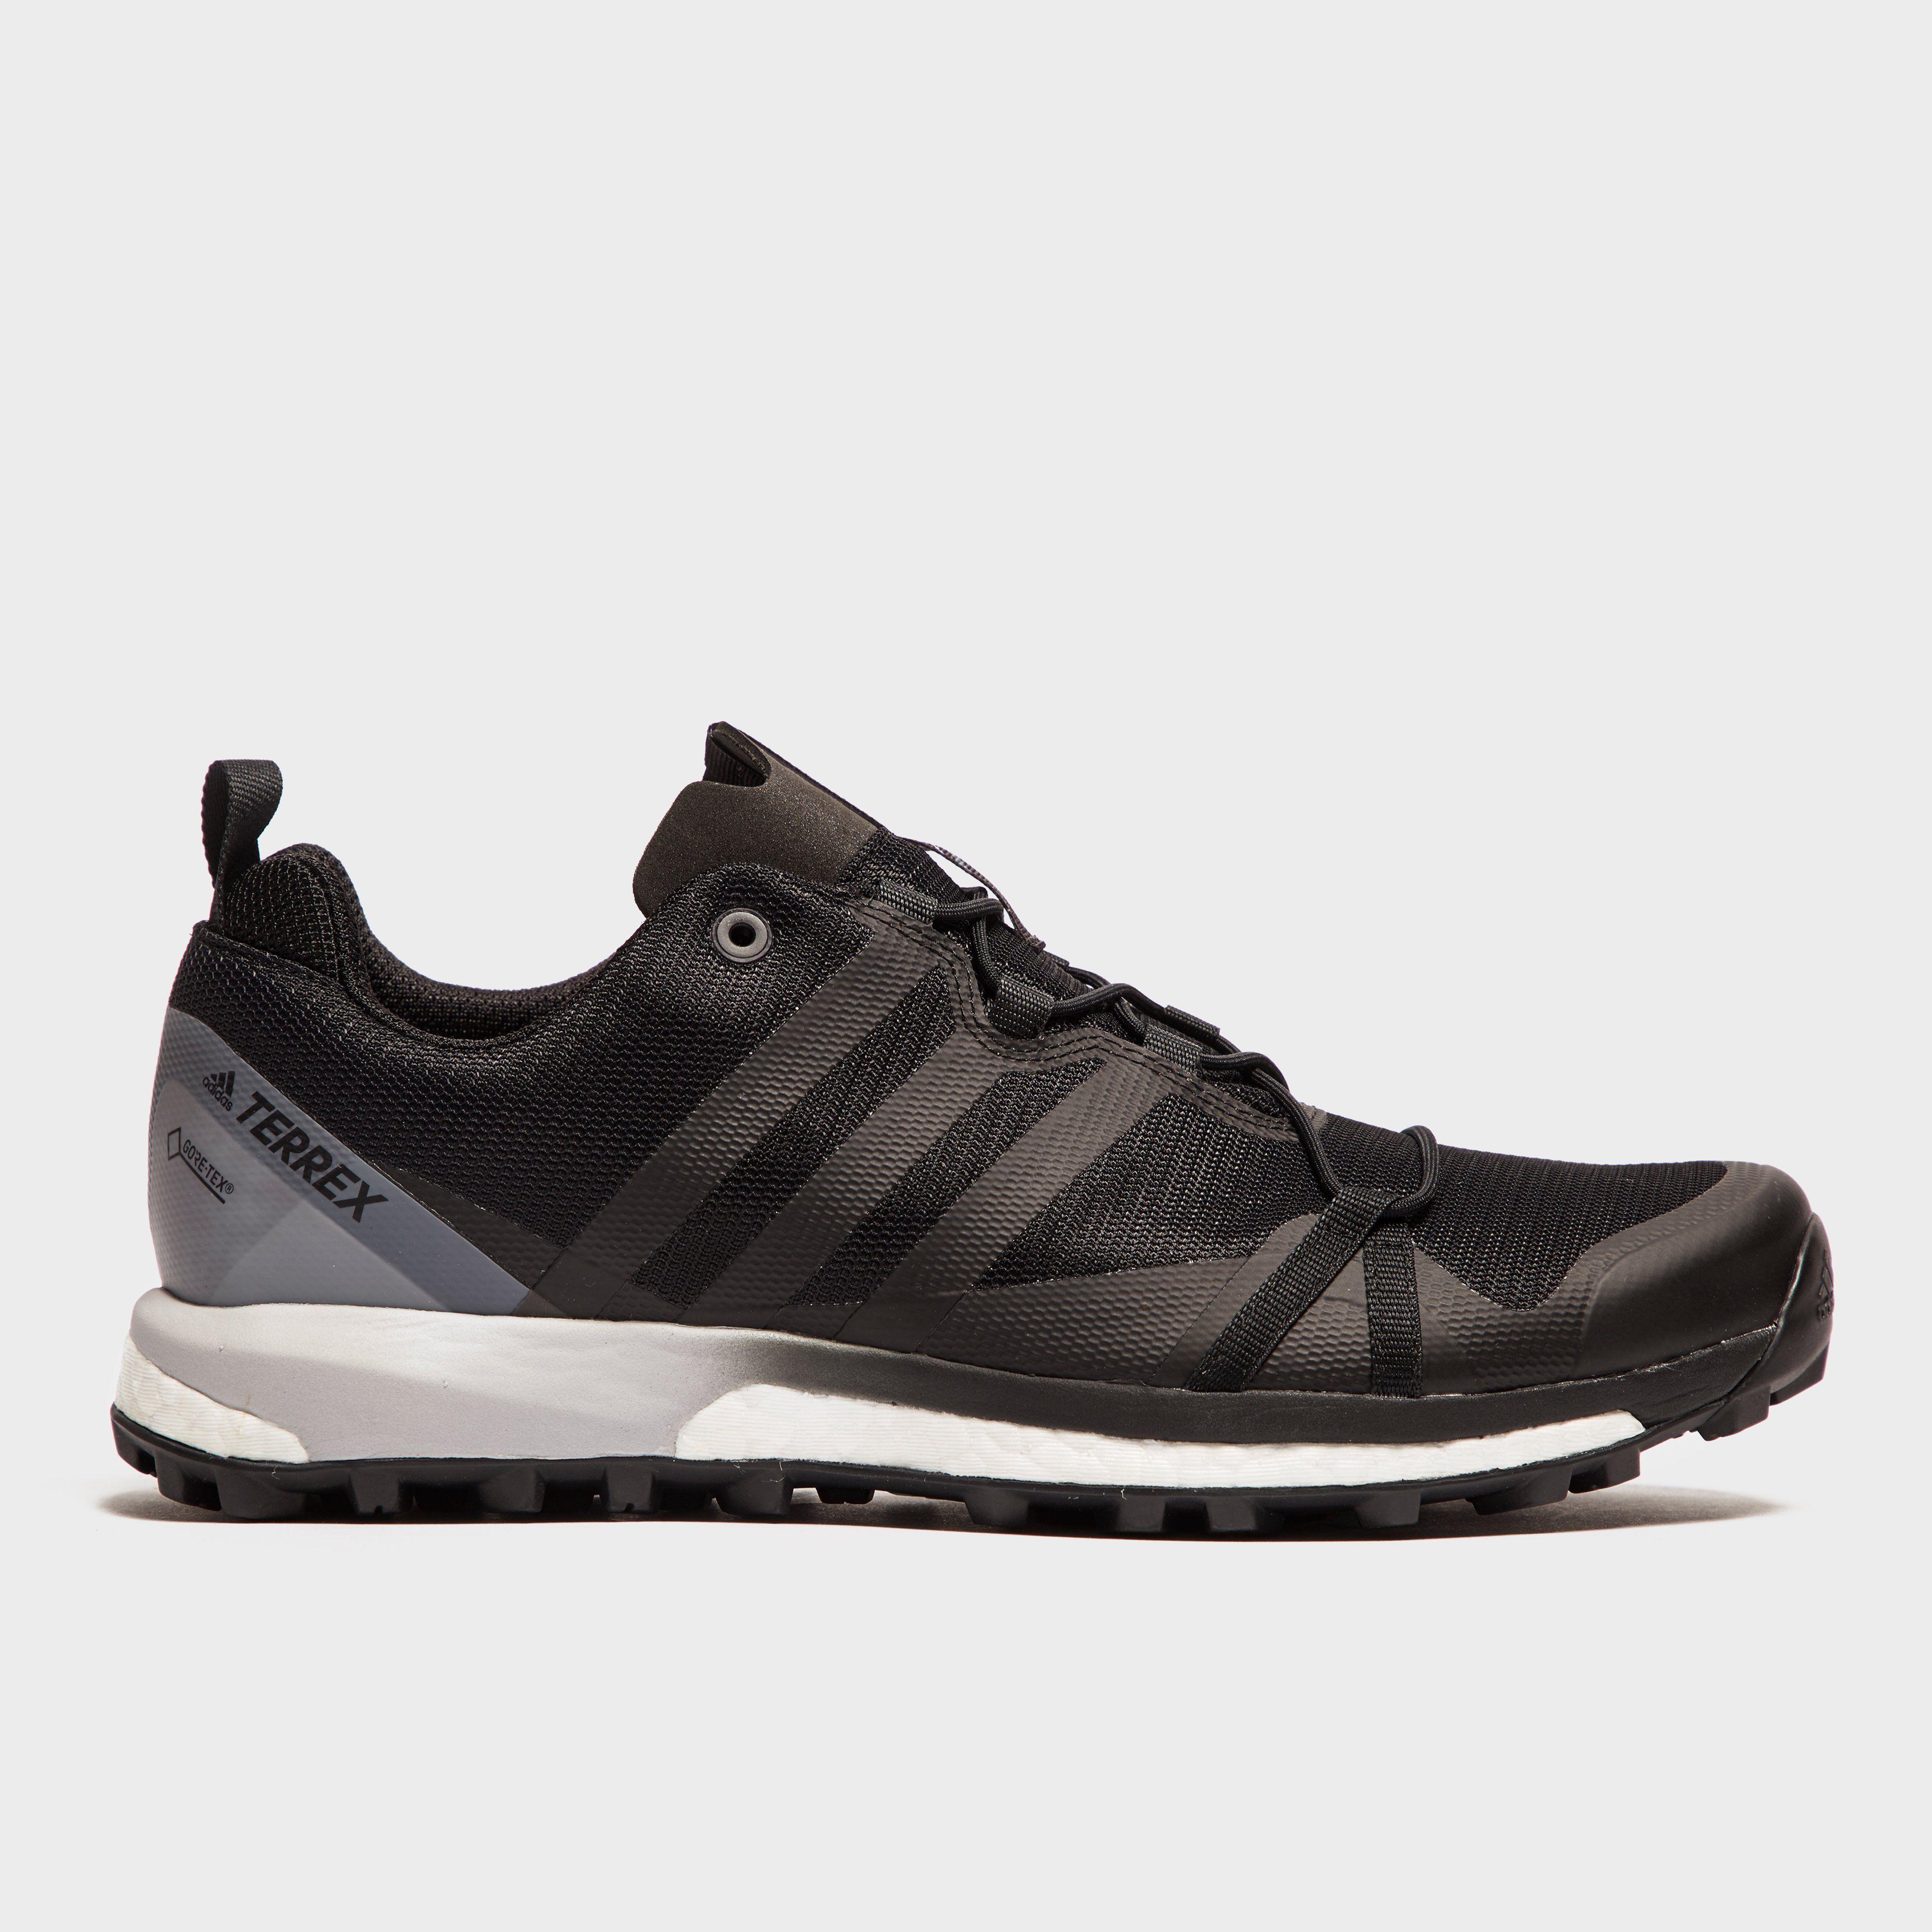 ADIDAS Men's Terrex Agravic GORE-TEX® Shoes